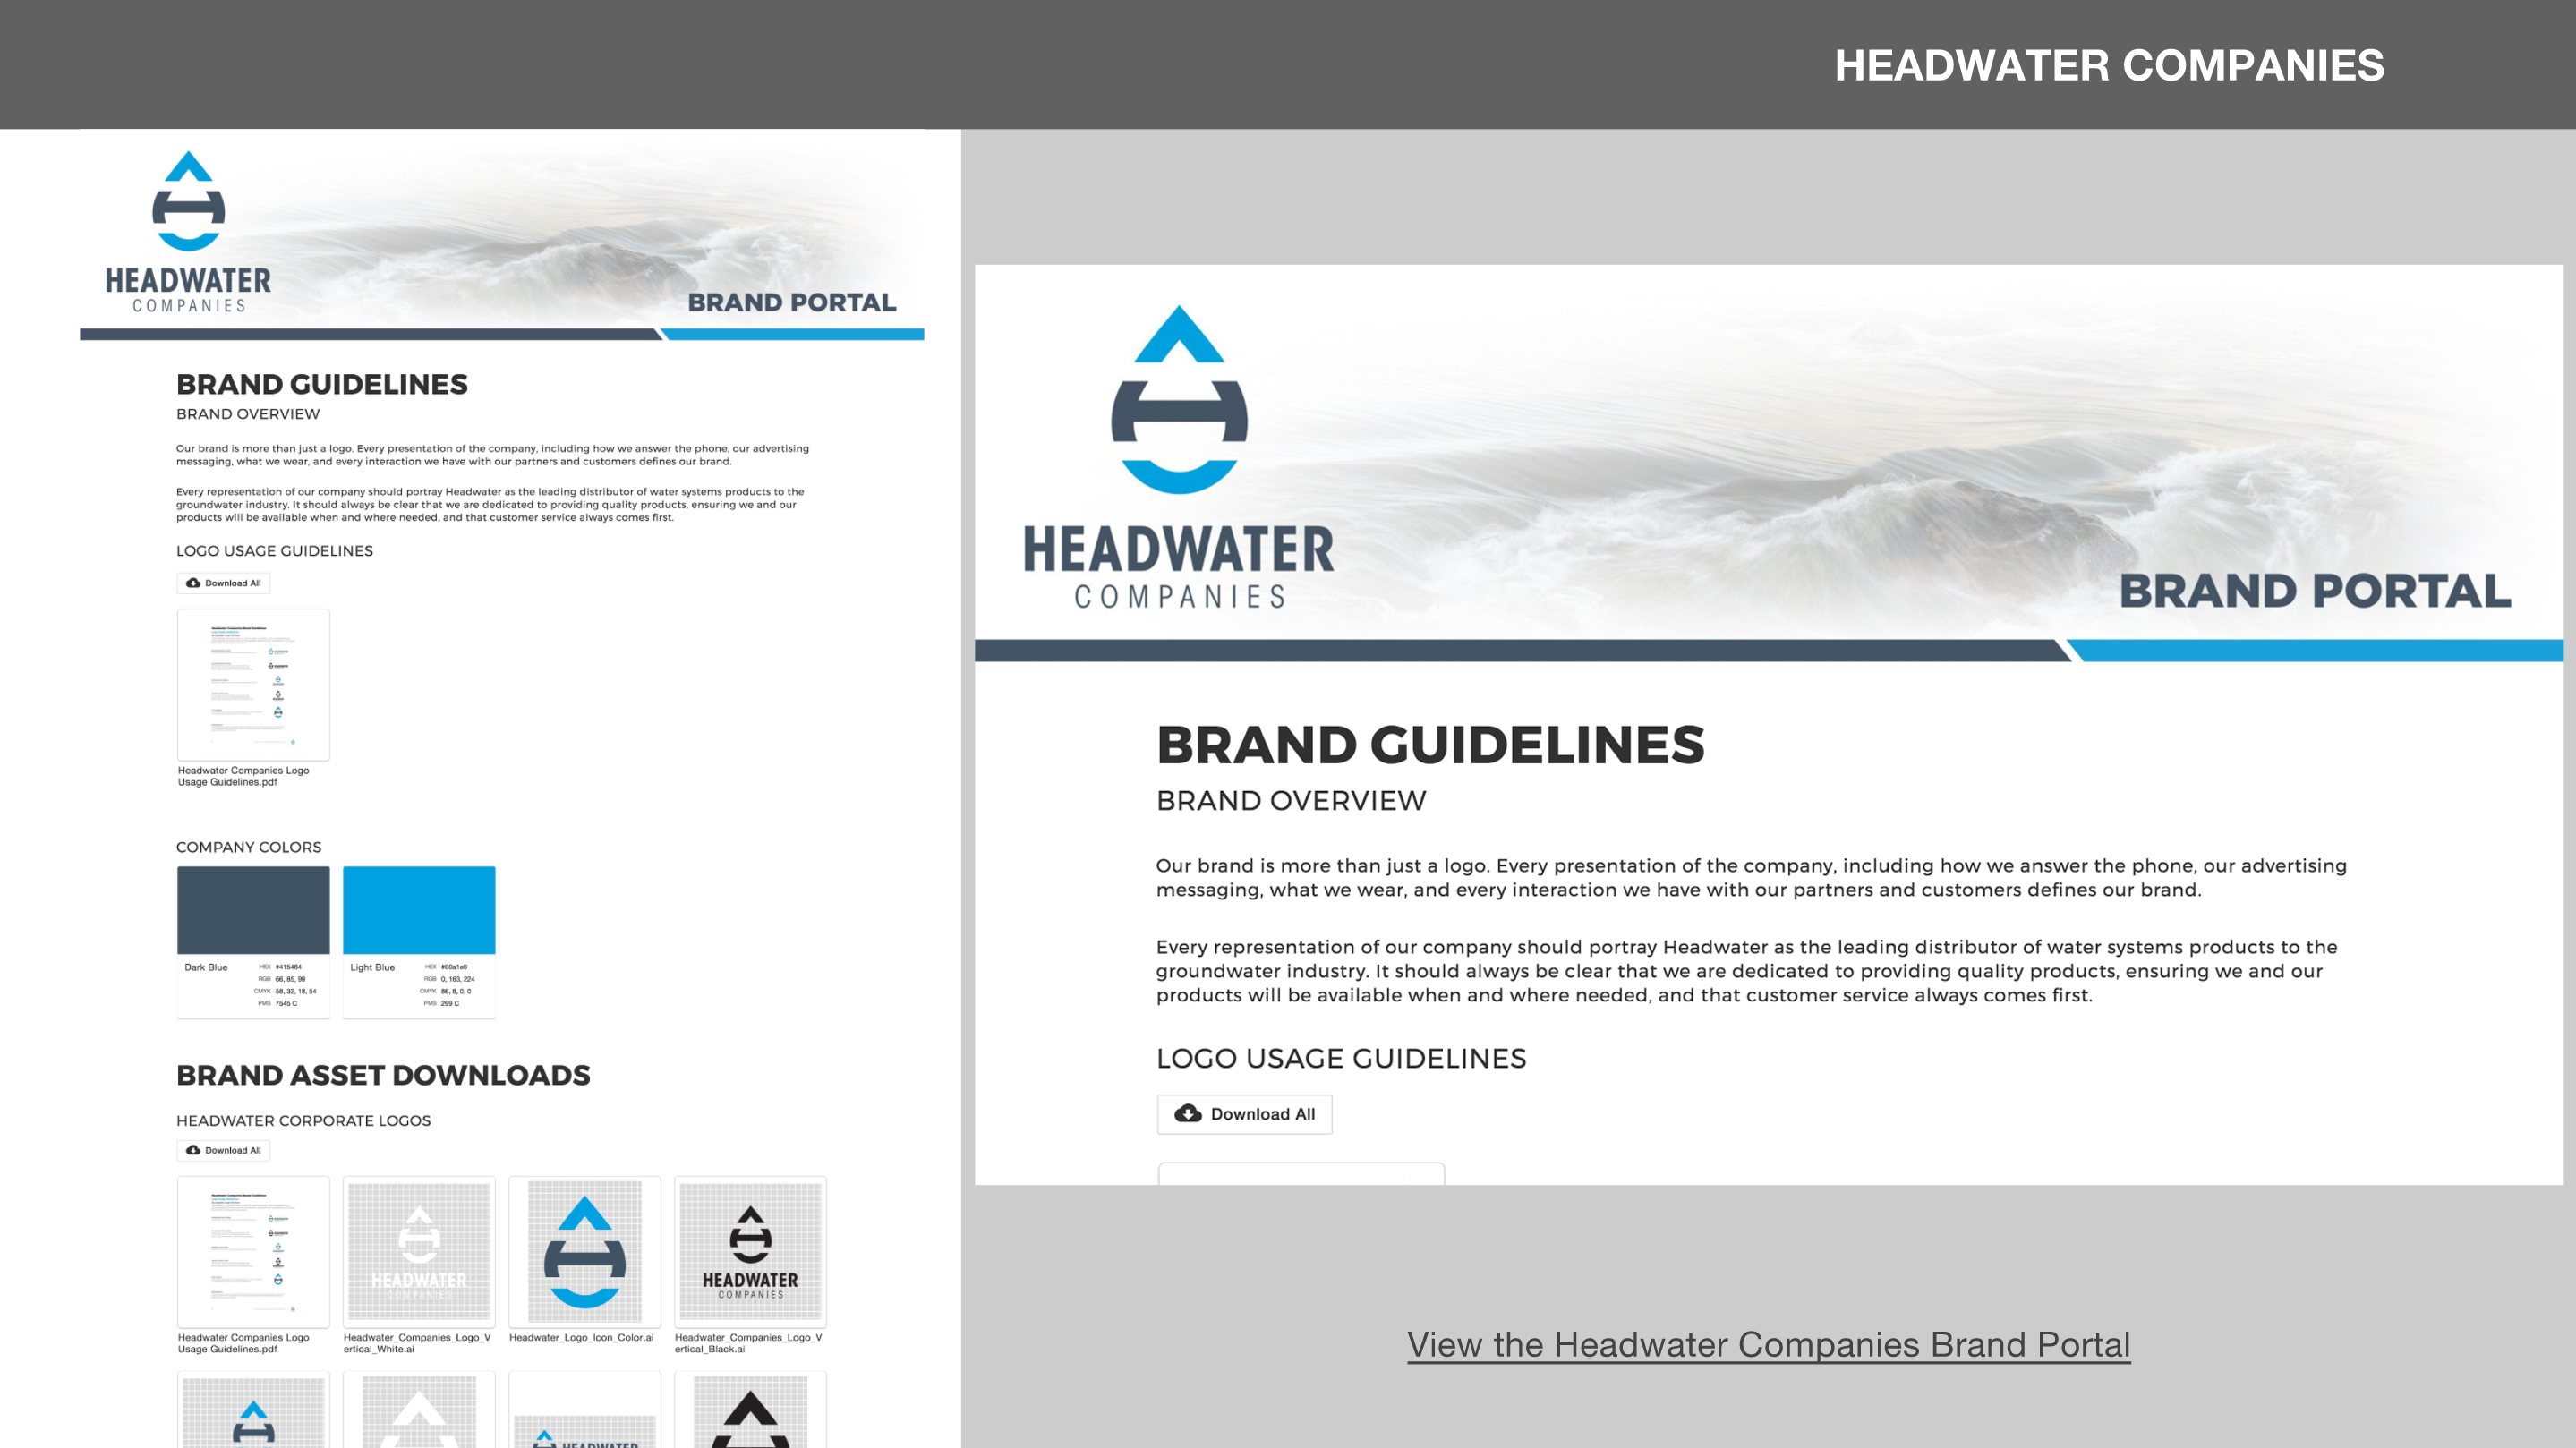 Headwater Companies Brand Portal